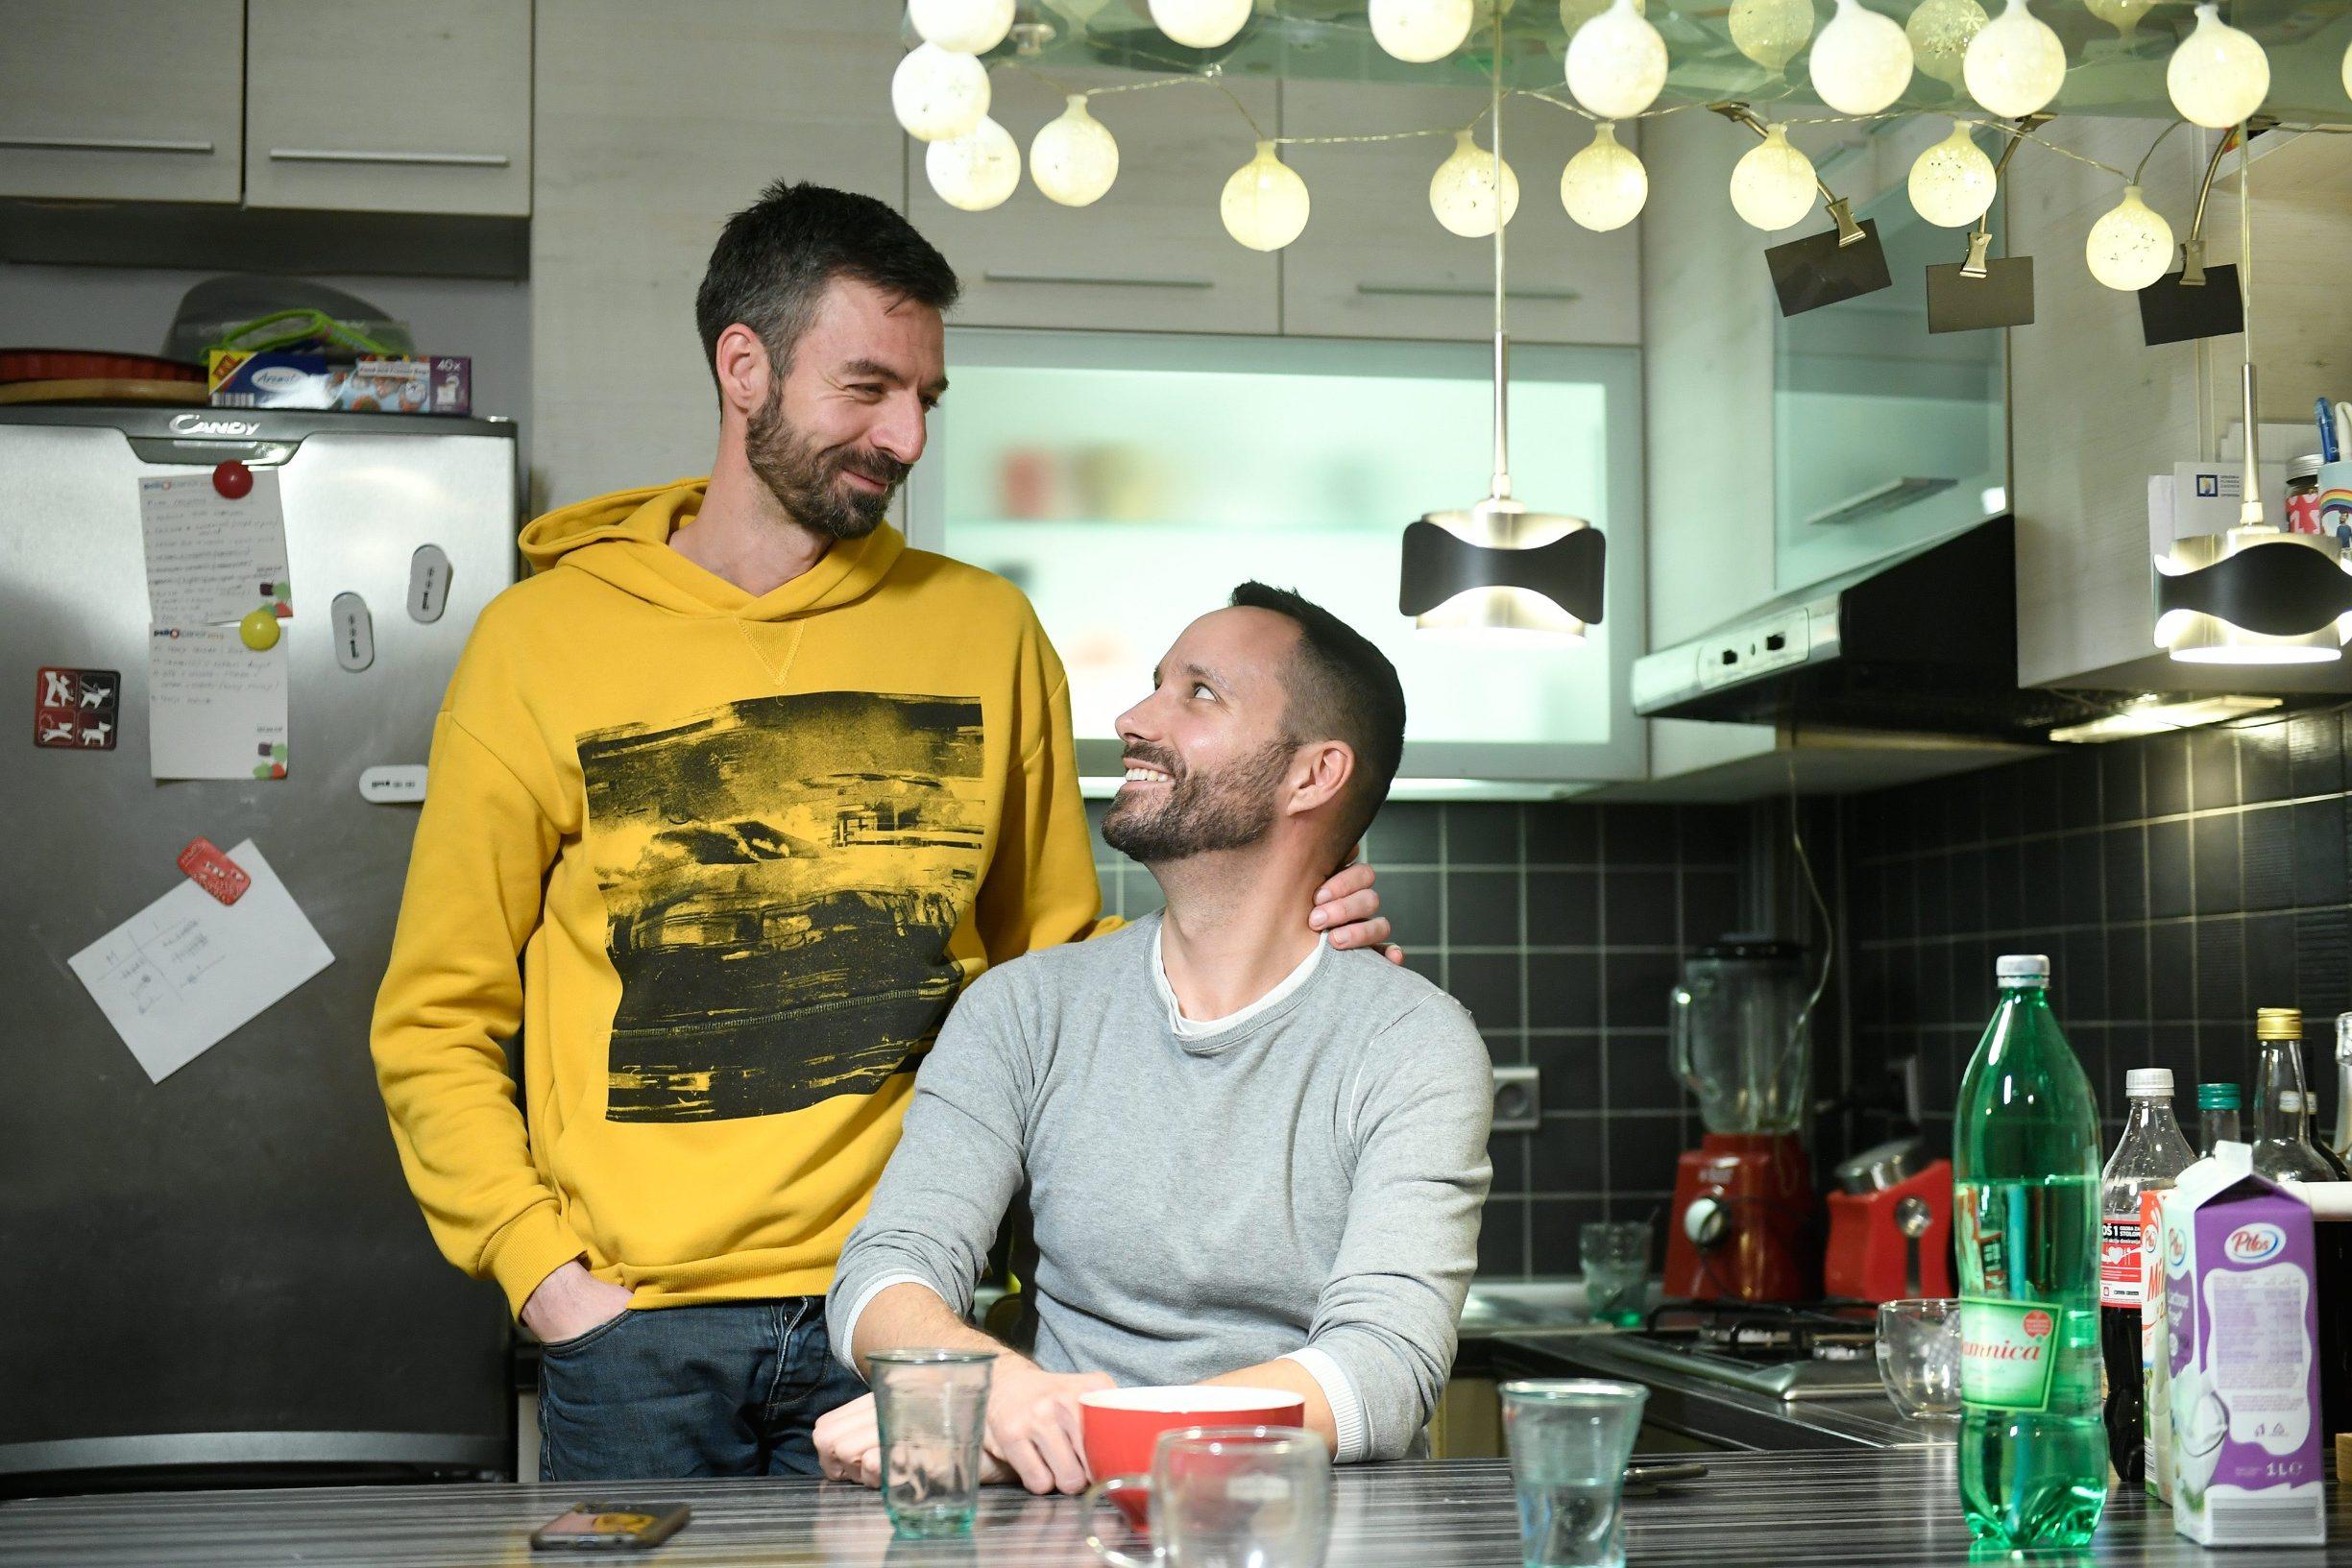 Zagreb, 290120. Remetinecki gaj. Reportaza o homoseksualnom paru Ivi Segoti i Mladenu  Kozicu. Foto: Goran Mehkek / CROPIX